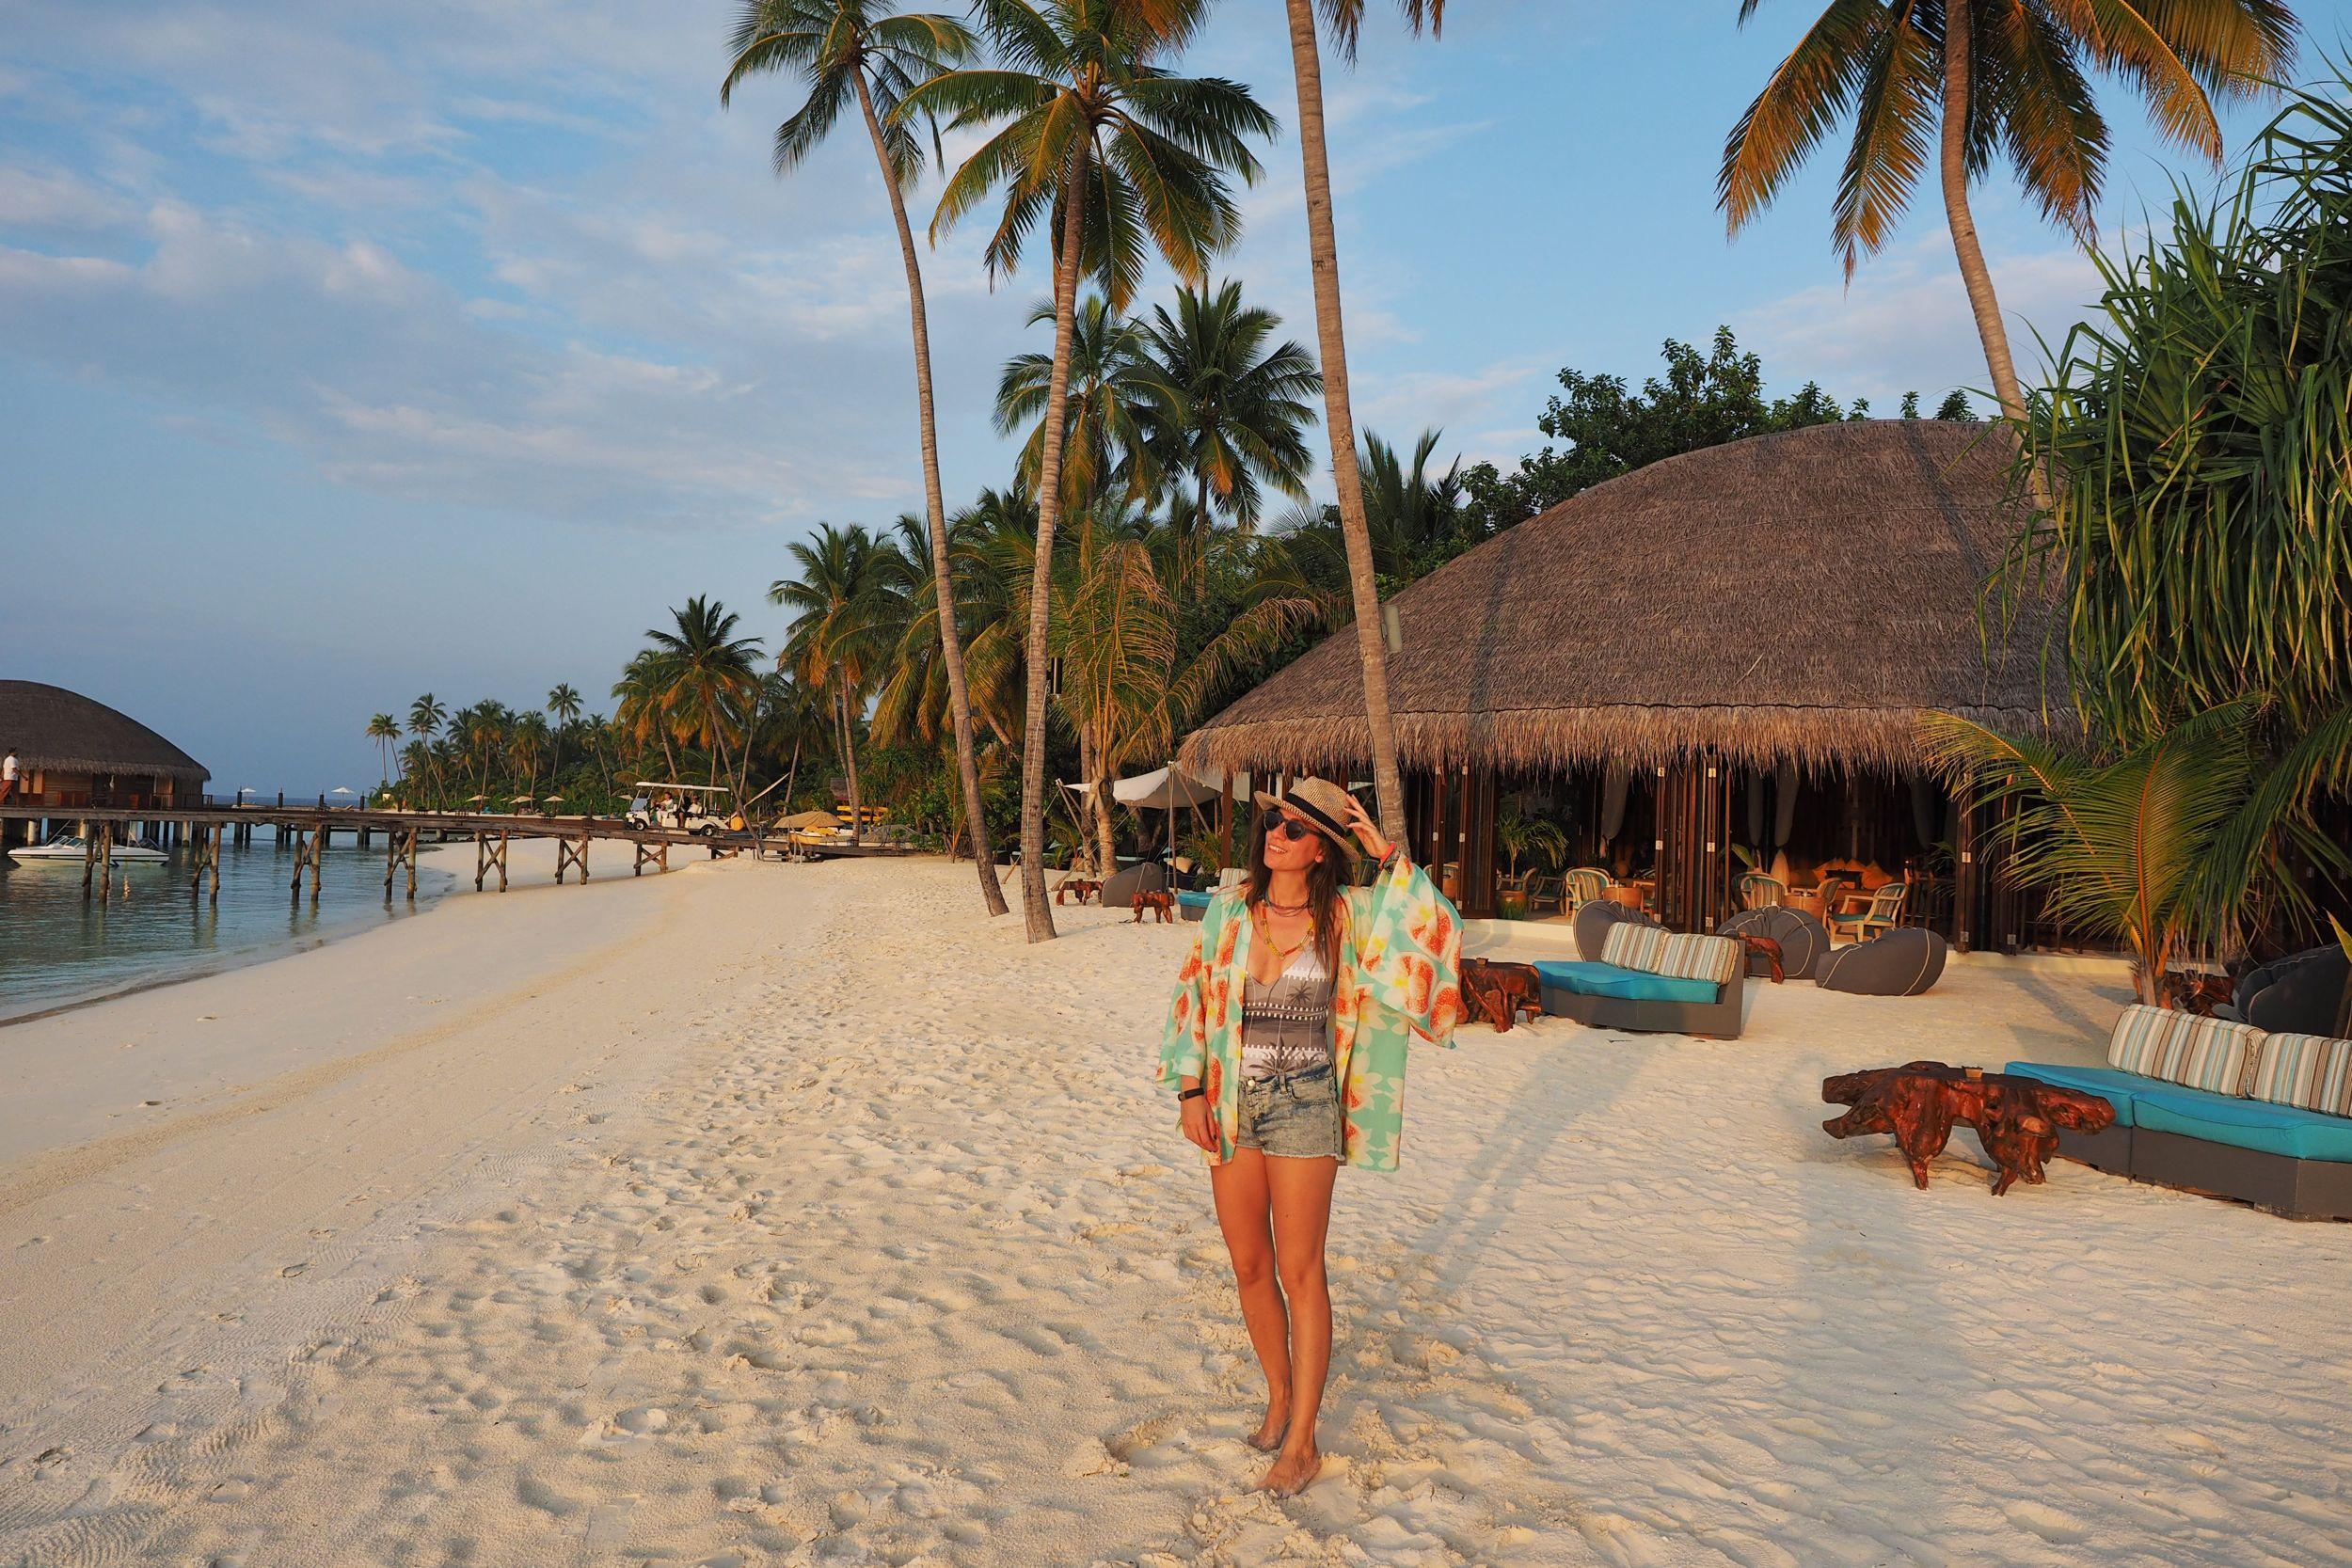 maldives, constance hotels,uspa, maldiv, constance, billur saatci, off nereye gitsem, offnegiysem, turkish blogger, heaven, vacation, moofushi, halaveli